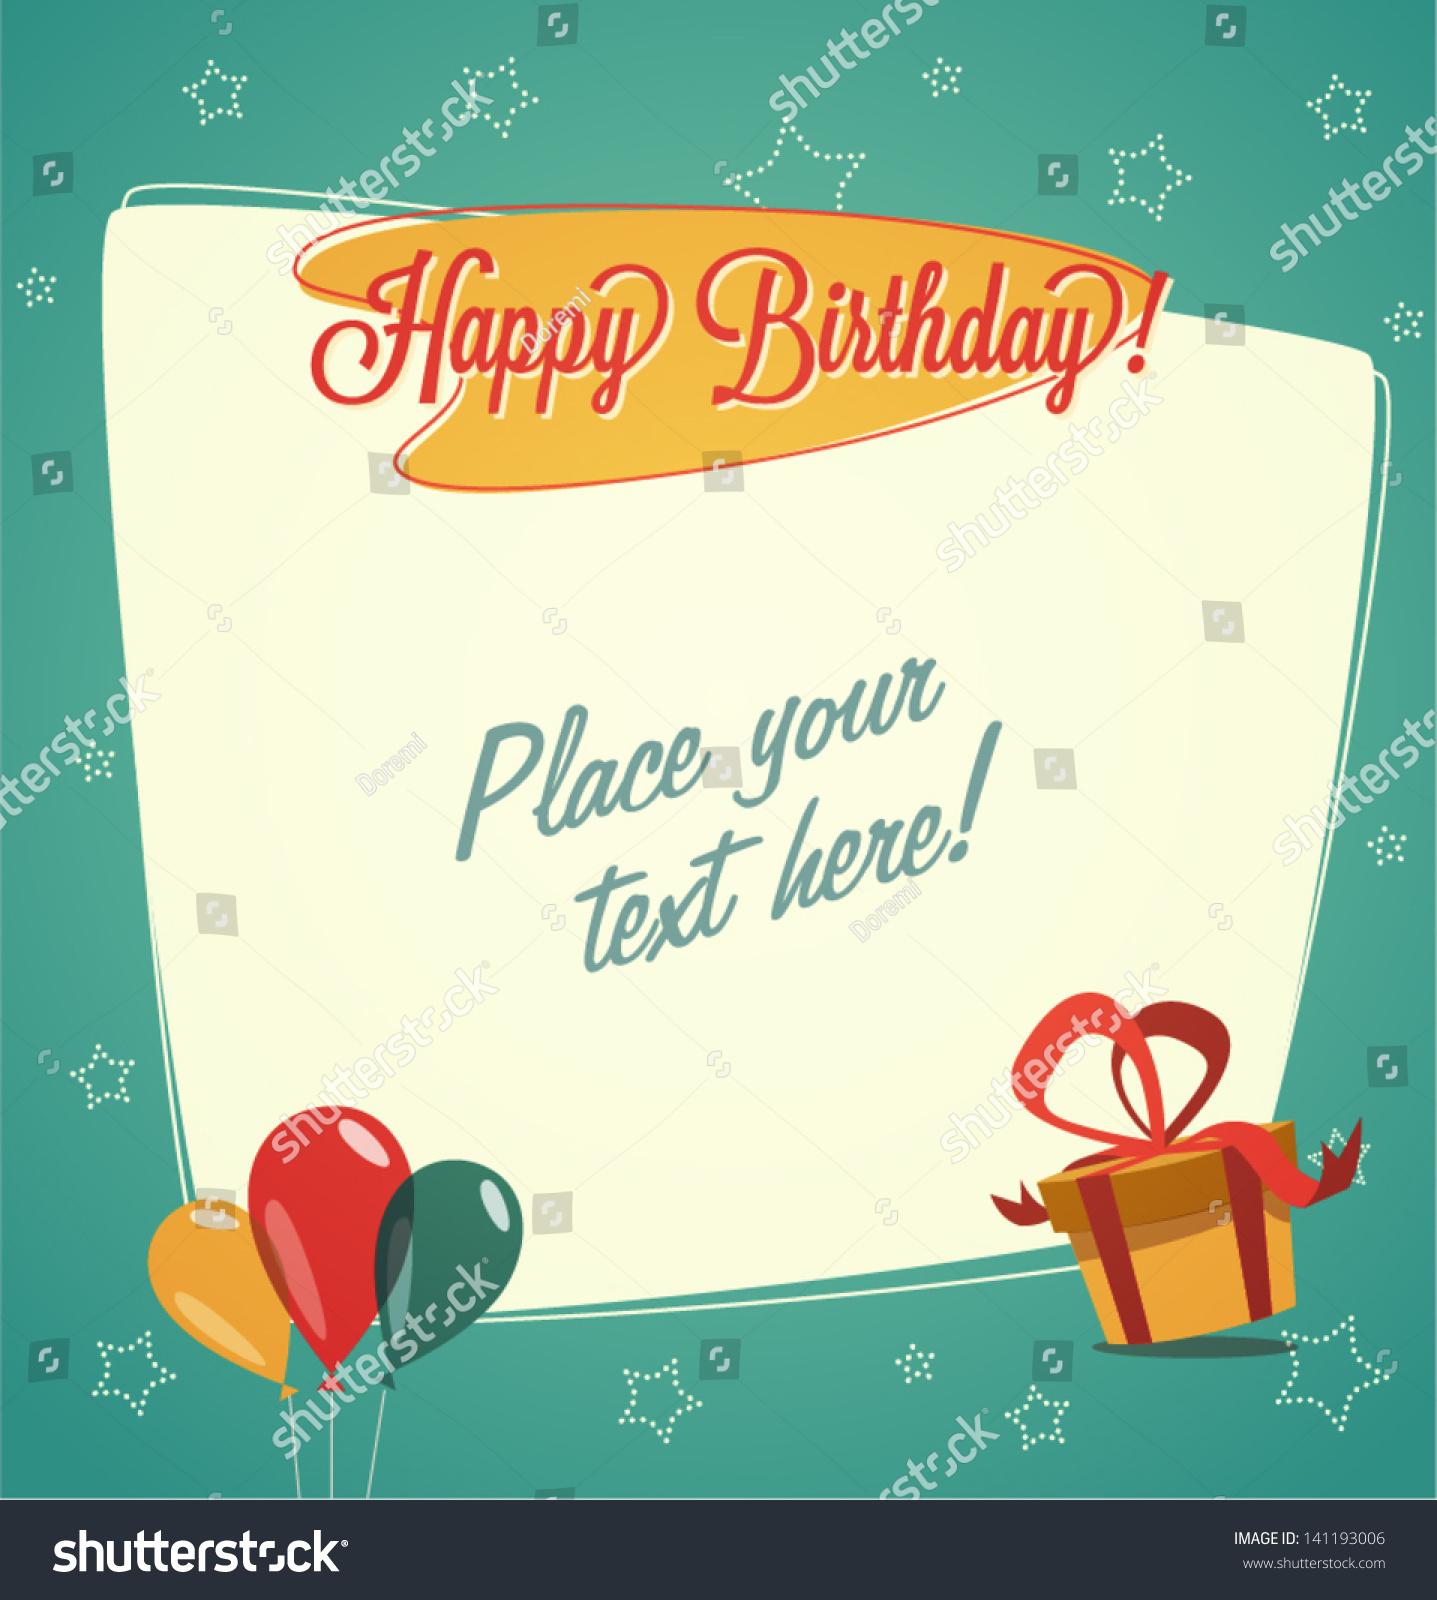 retro vintage happy birthday card stock vector illustration, Birthday card